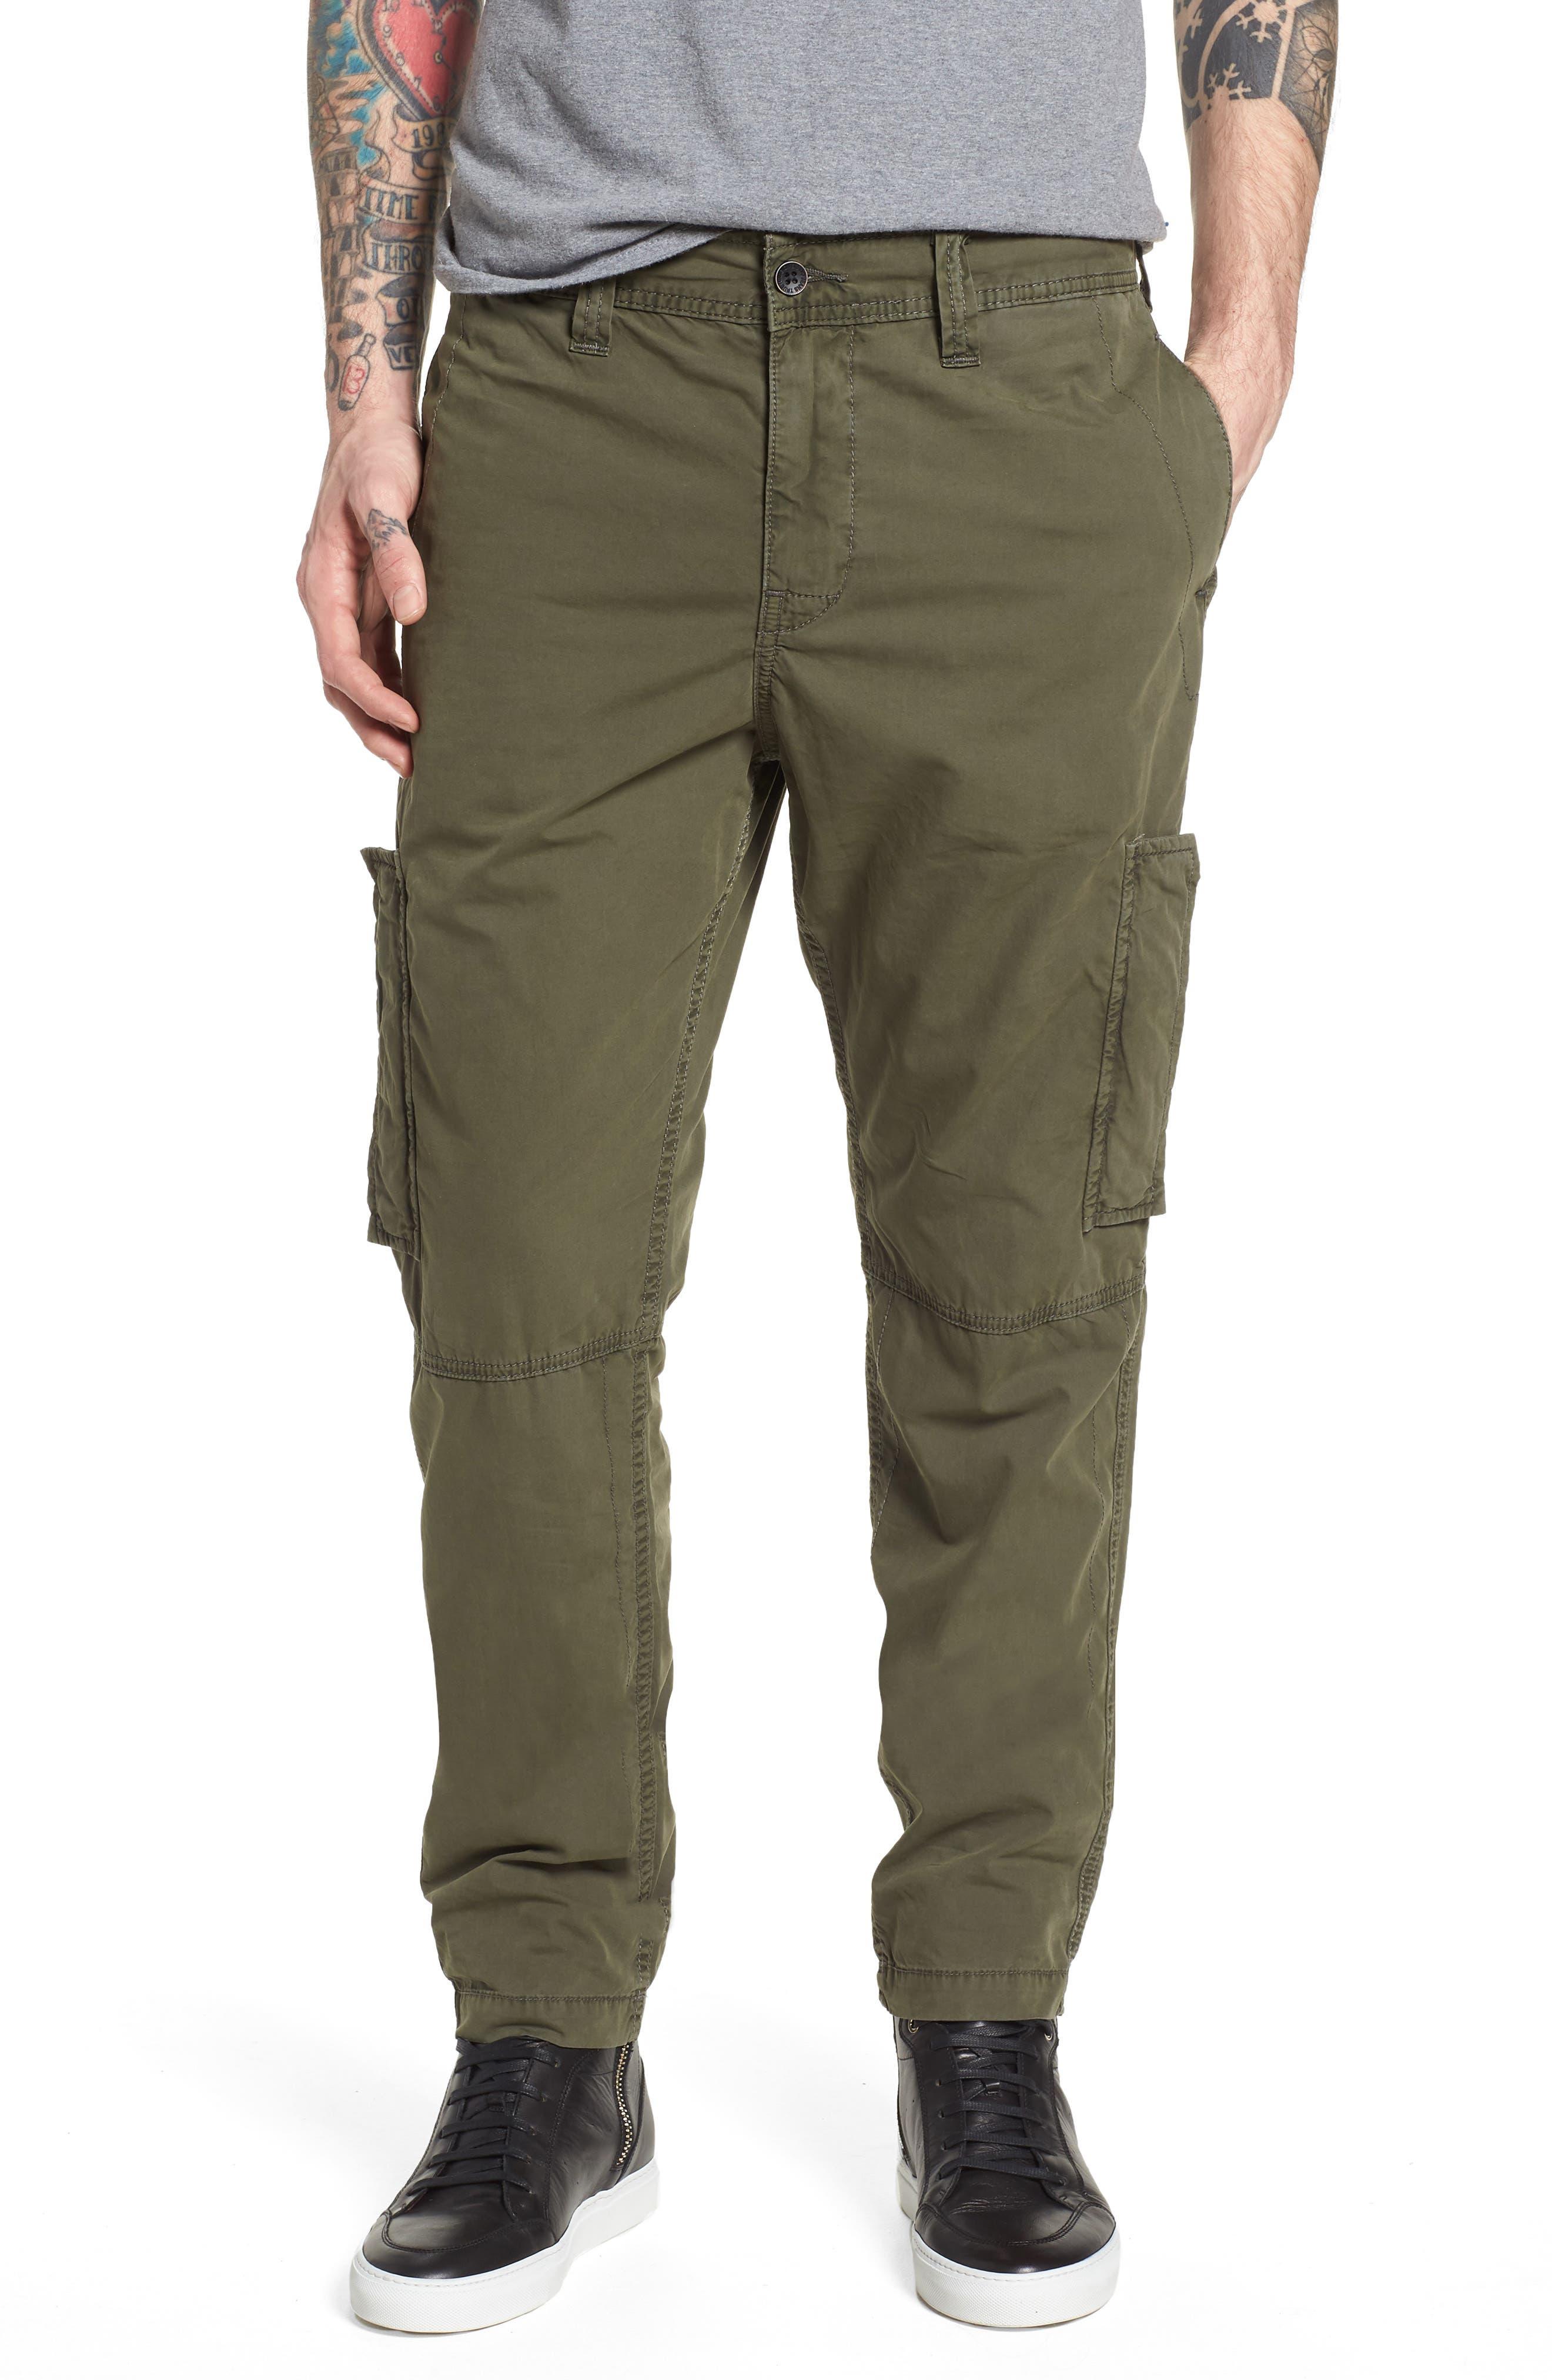 Officer Field Pants,                         Main,                         color, Epj Militant Green